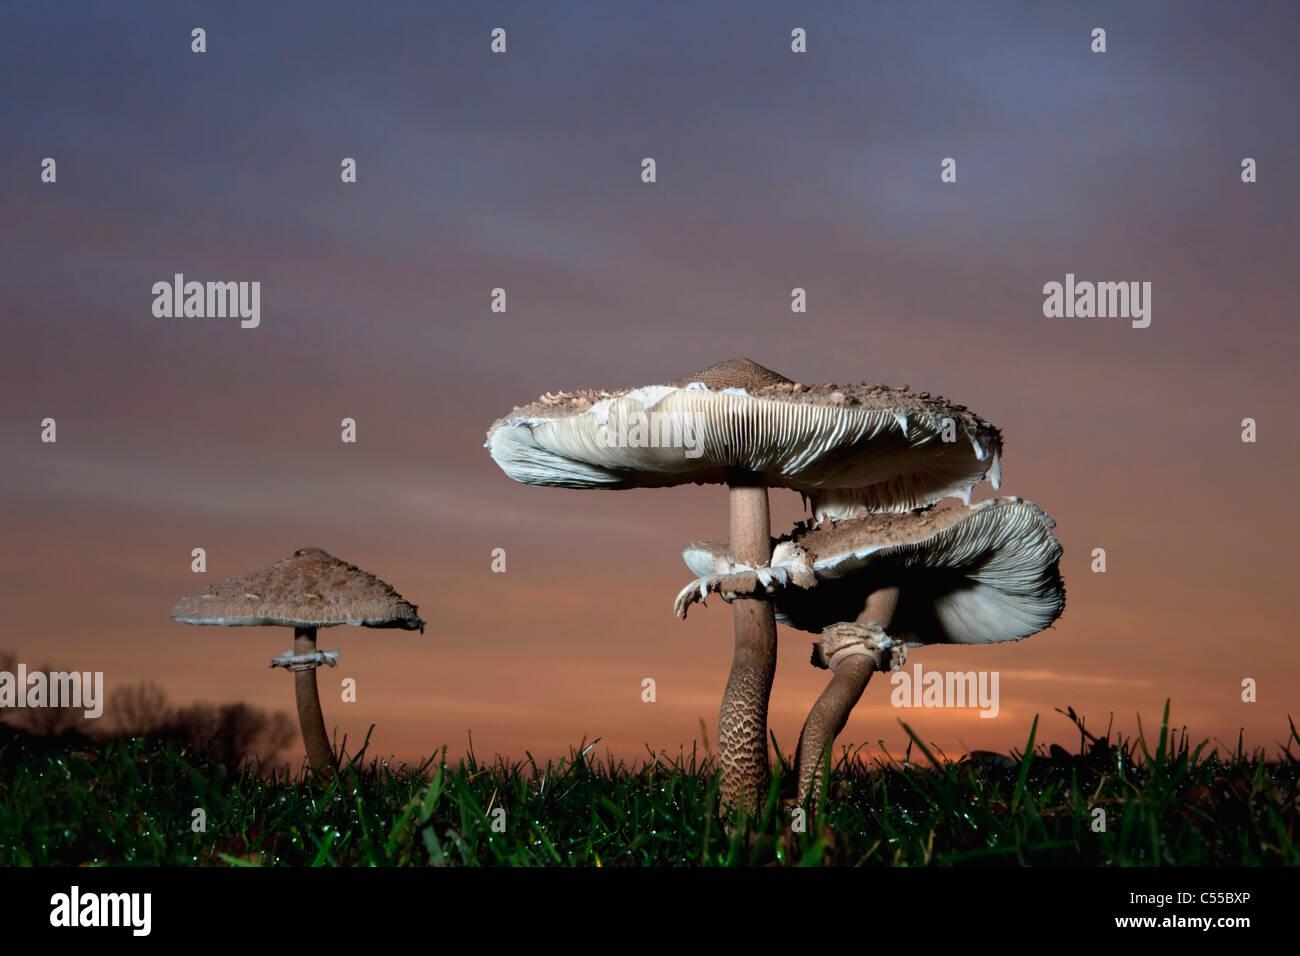 The Netherlands, Winterswijk, Autumn, Parasol Mushroom at dawn. Macrolepiota procera. - Stock Image